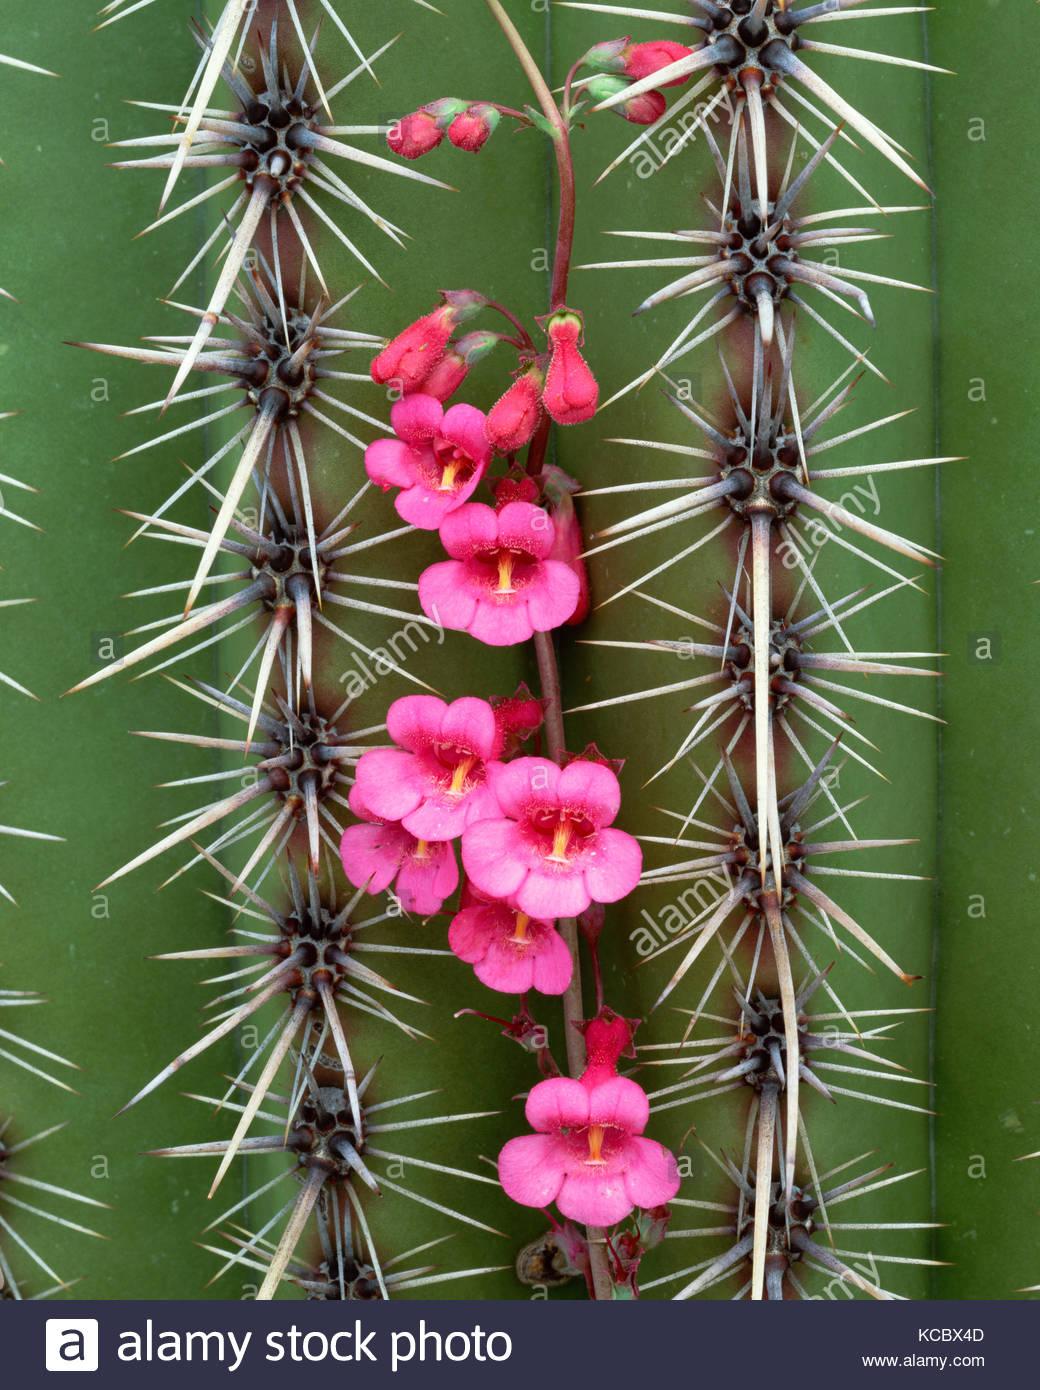 Penstemon Growing on Saguaro Cactus, Saguaro National Park, Arizona - Stock Image